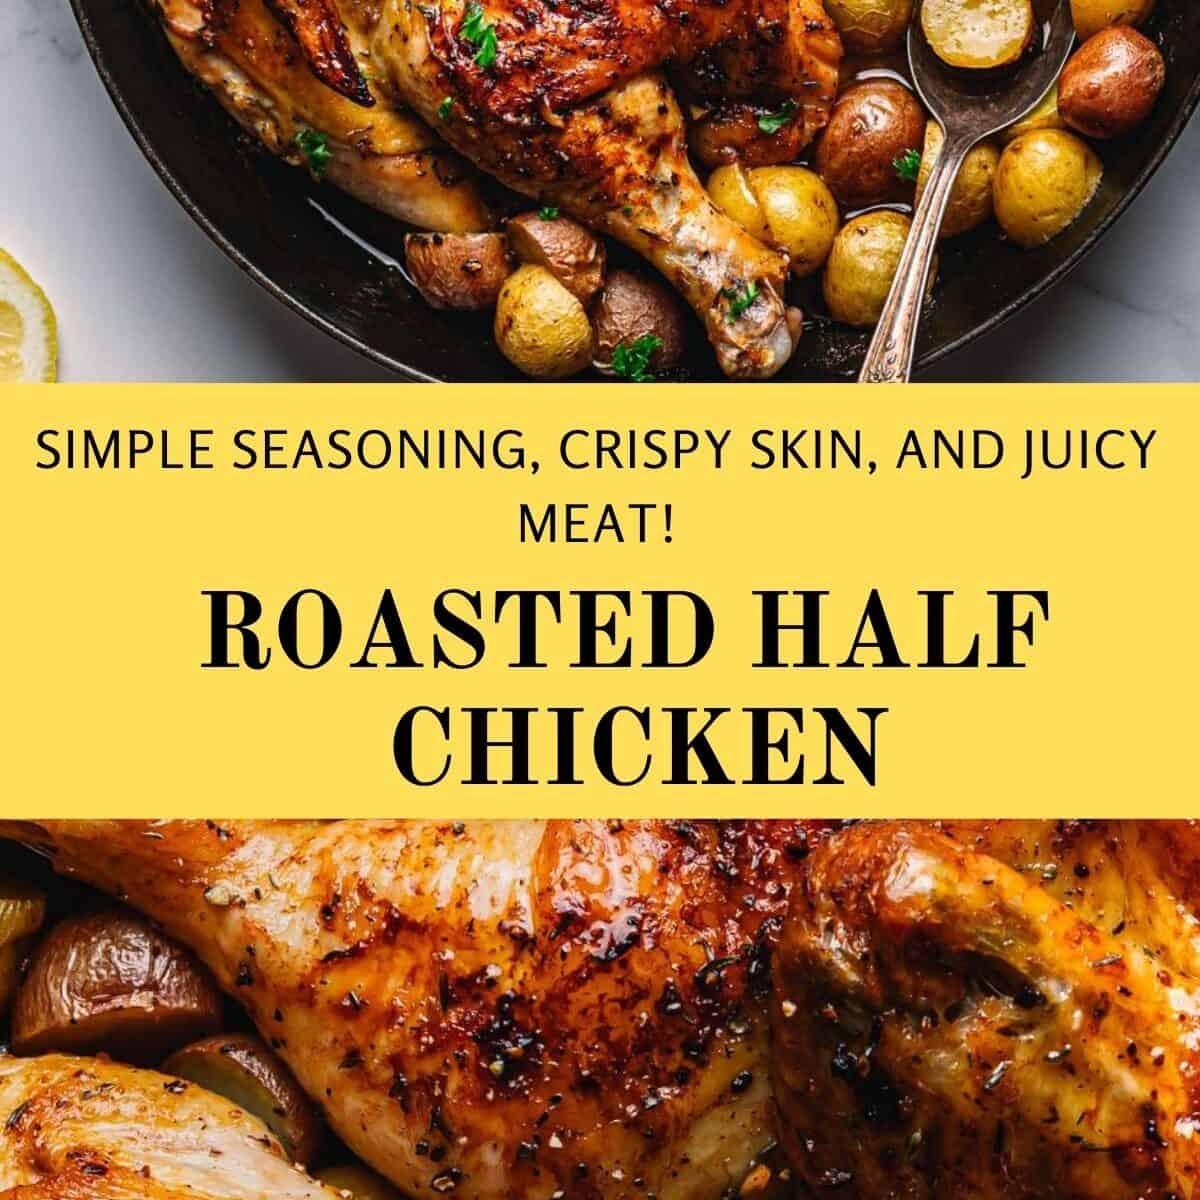 Roasted Half Chicken Recipe